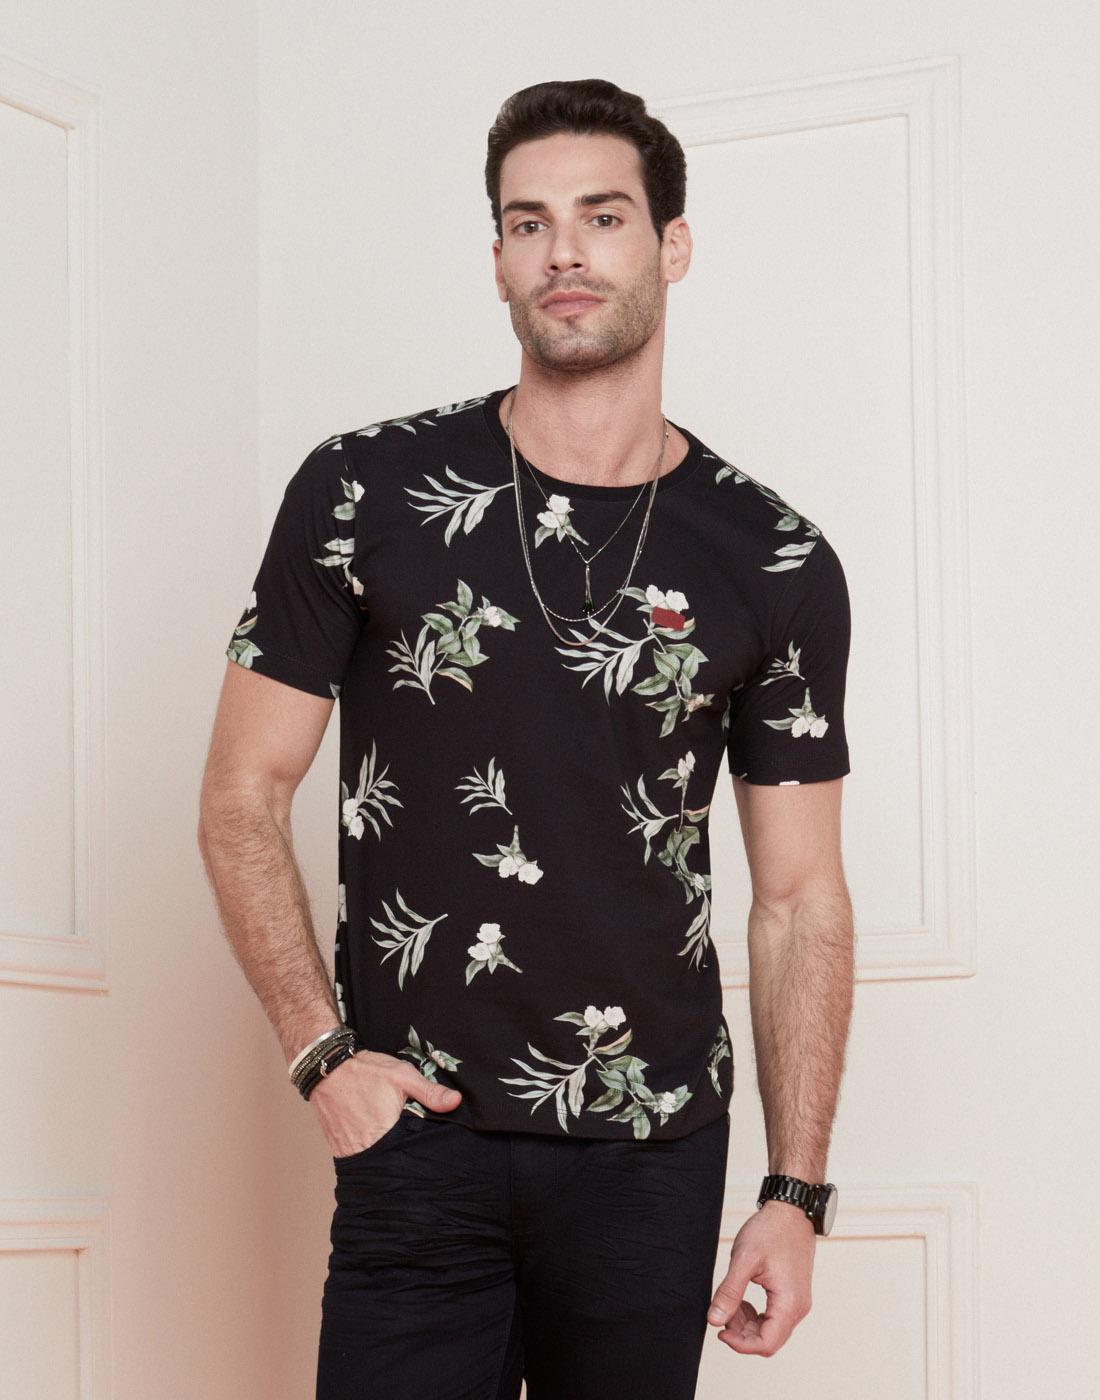 Camiseta Masc. Estampa Tropical Preta Six One